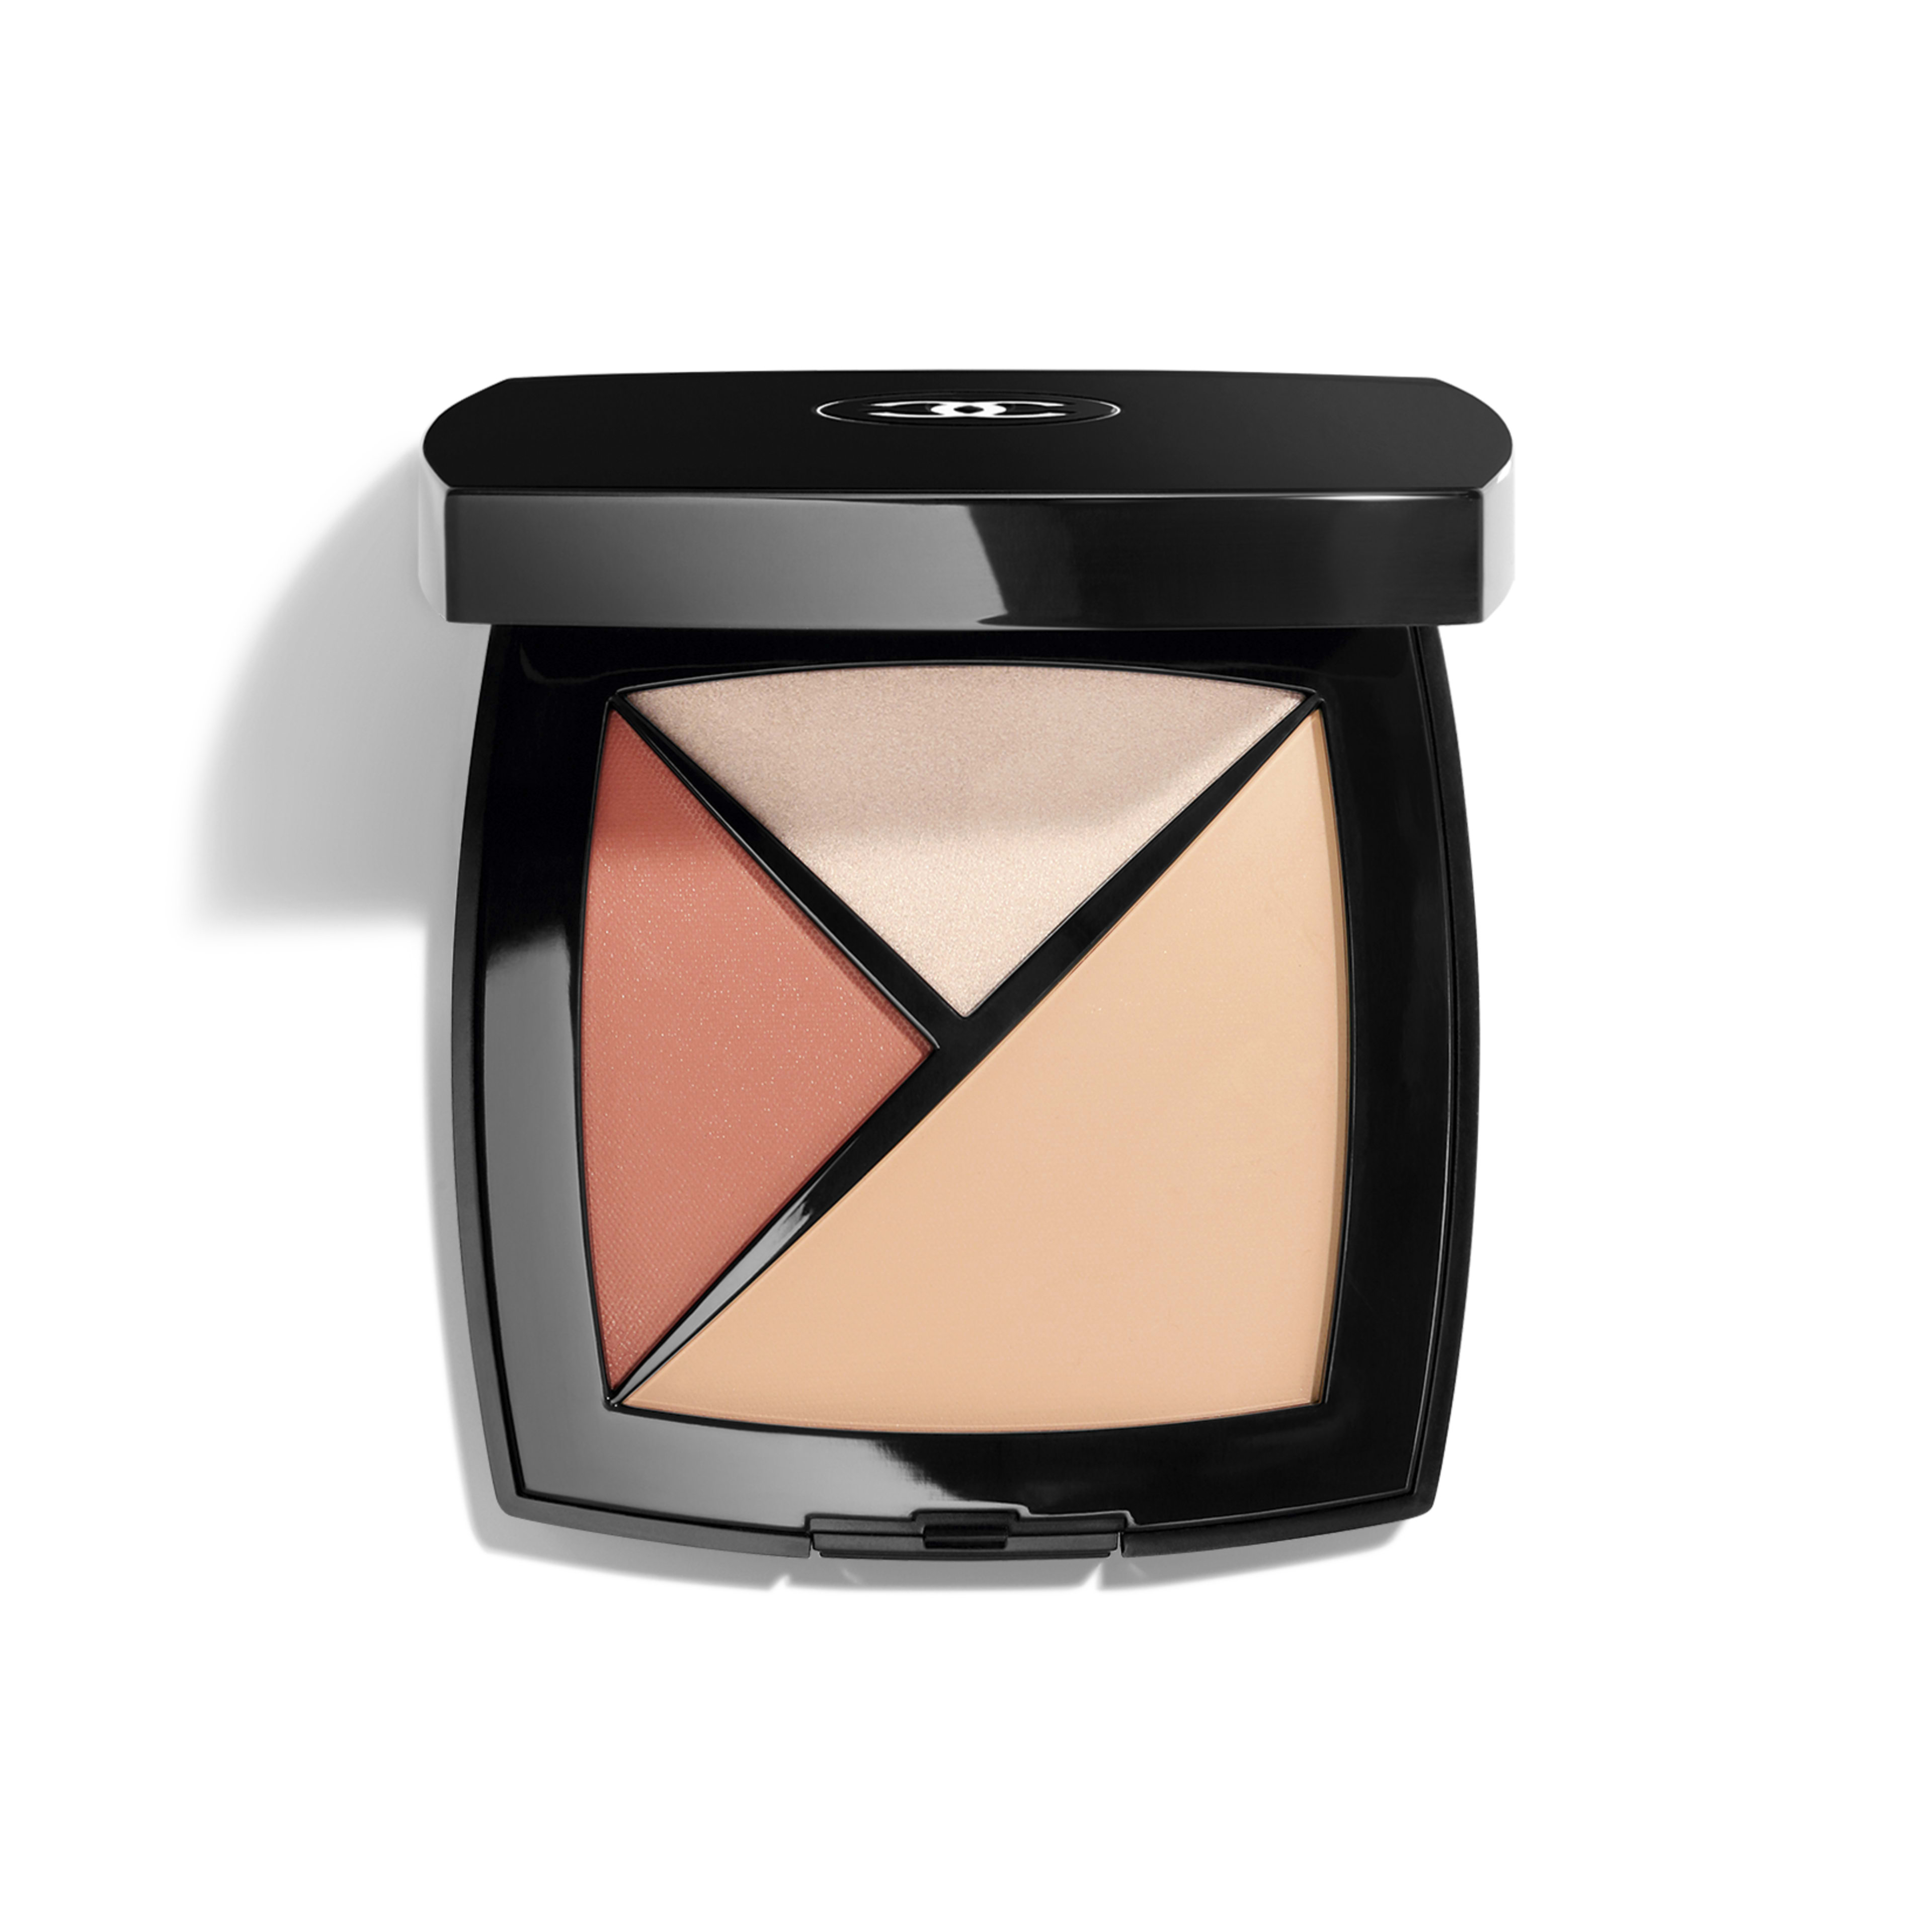 PALETTE ESSENTIELLE - makeup - 9g - Widok domyślny